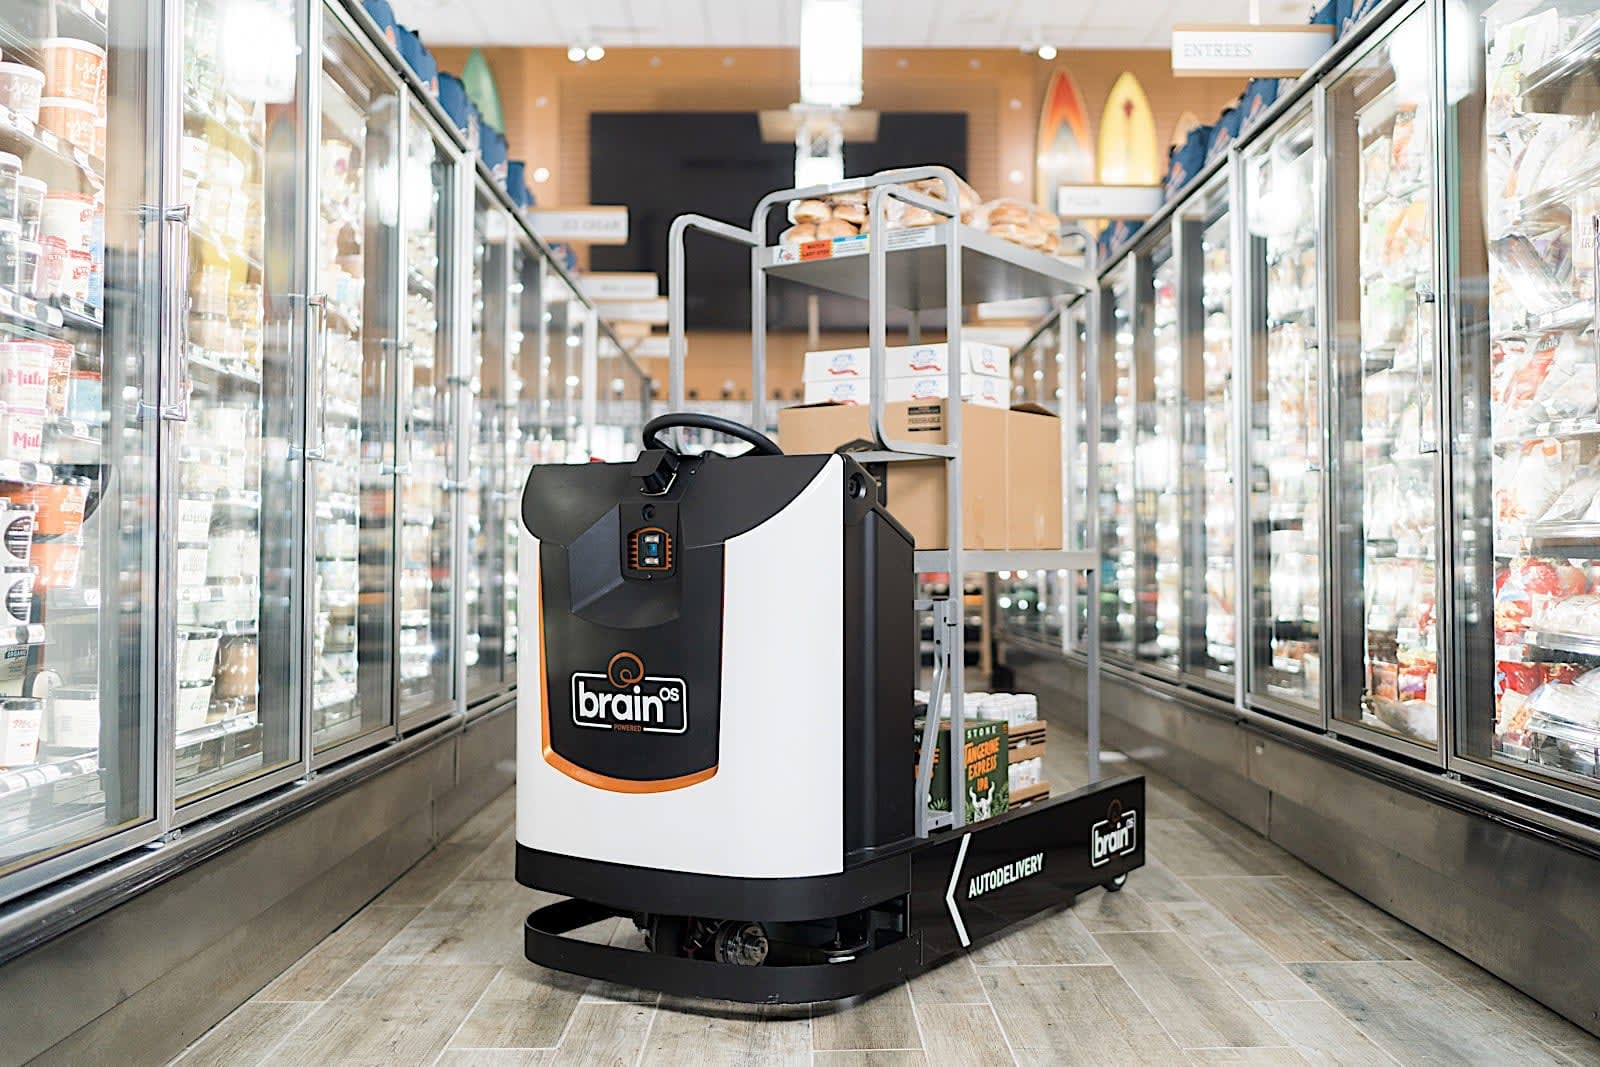 BrainCorp brings its autonomous robot tech to your local